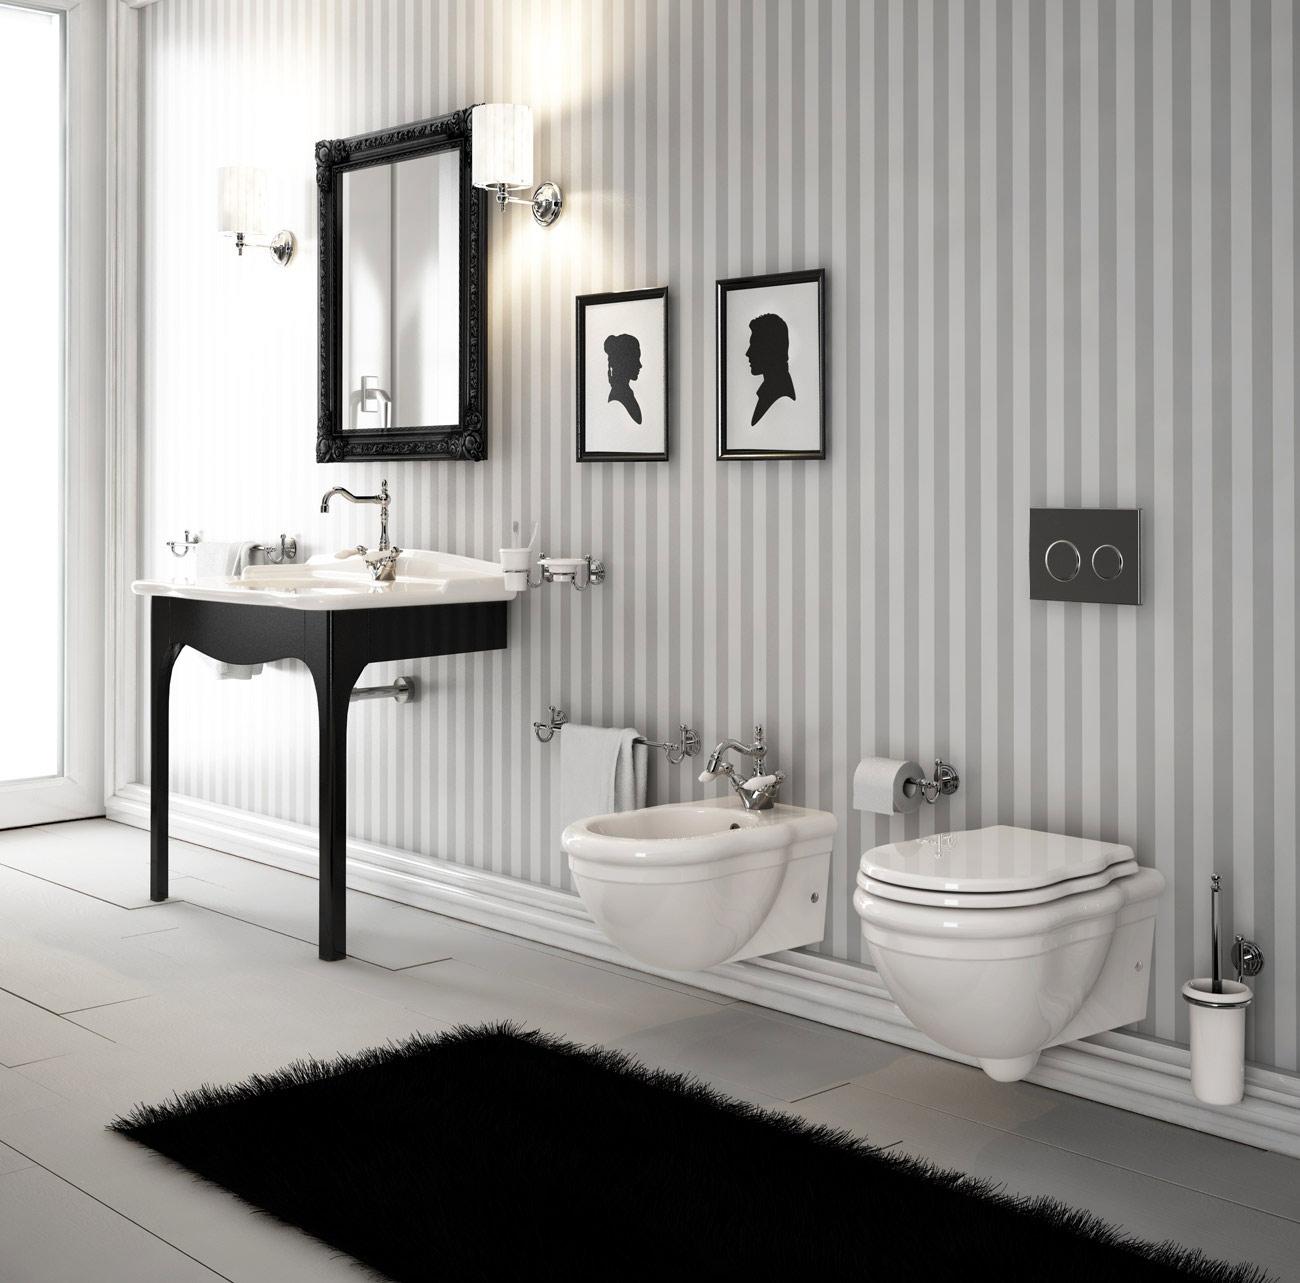 Consolle 93 monoforo ellade for Consolle bagno